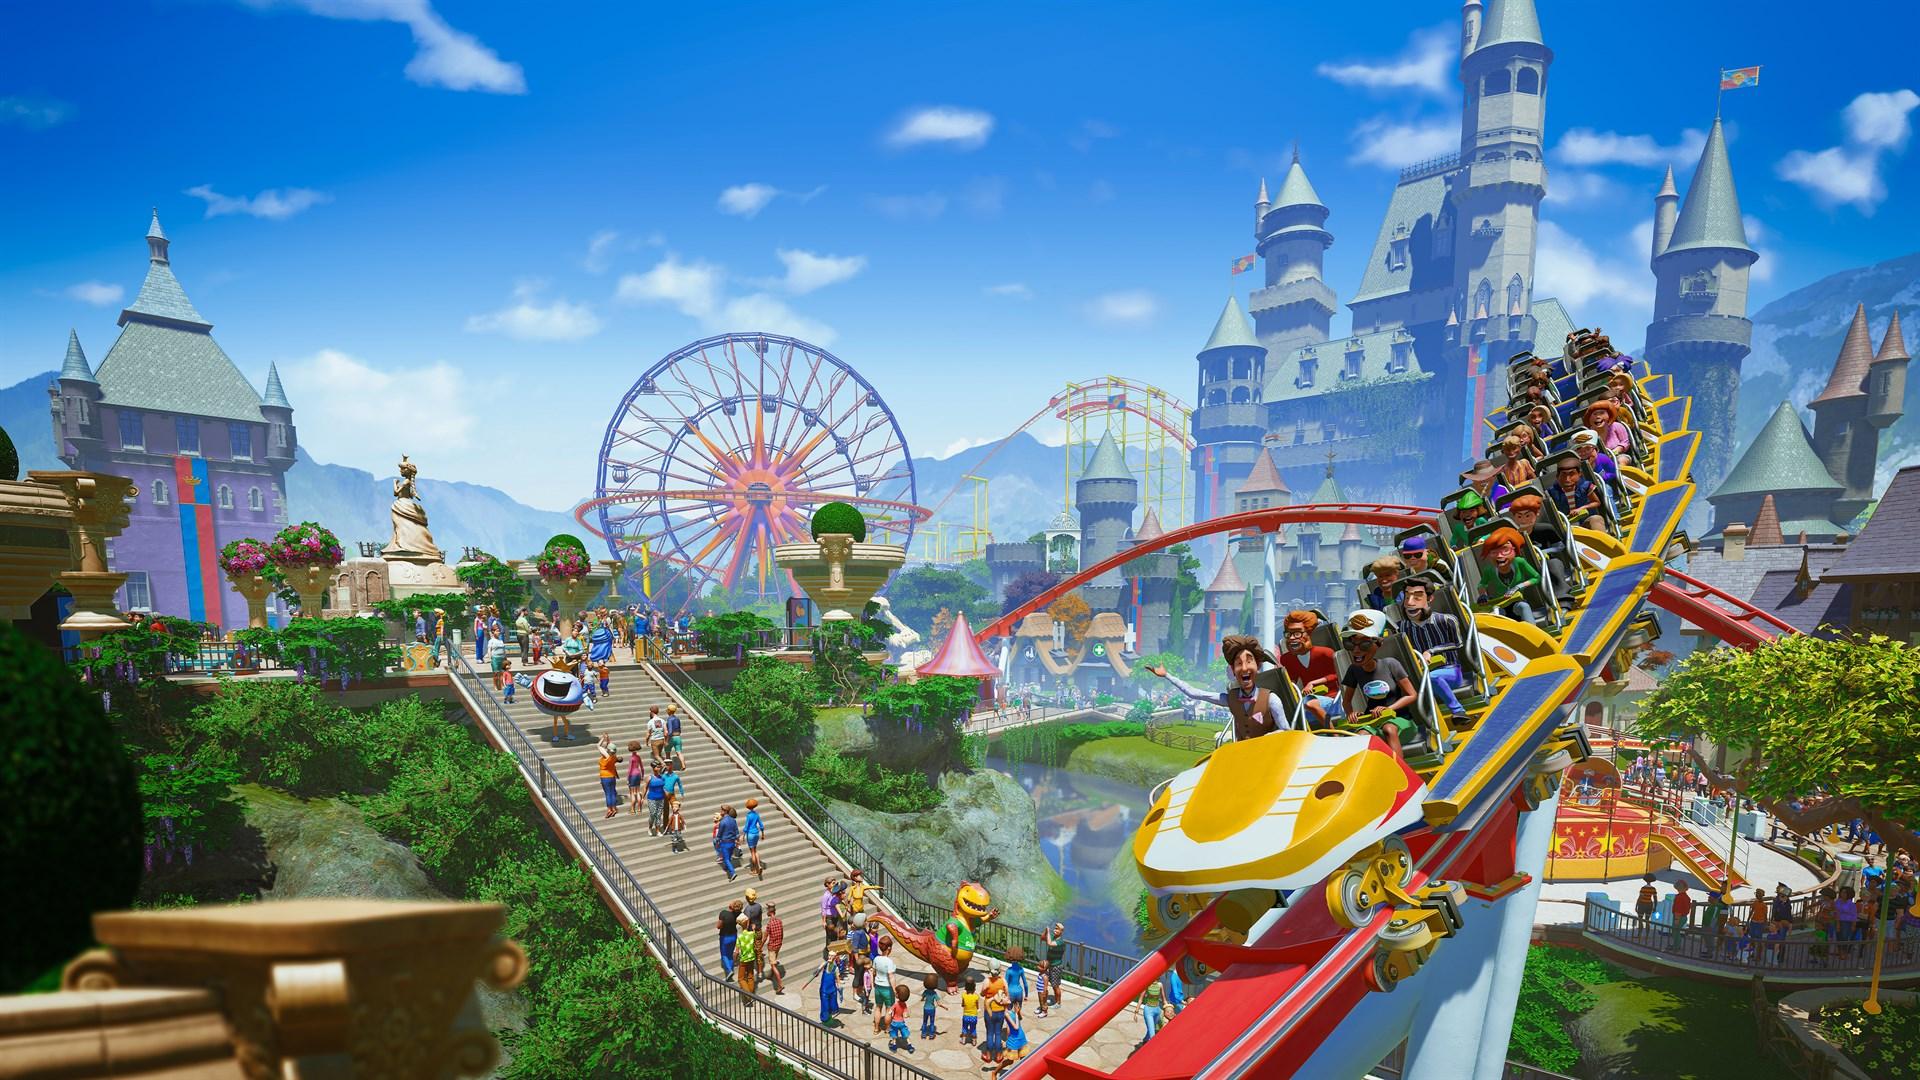 Planet Coaster: Oswald's Magnificent Machine